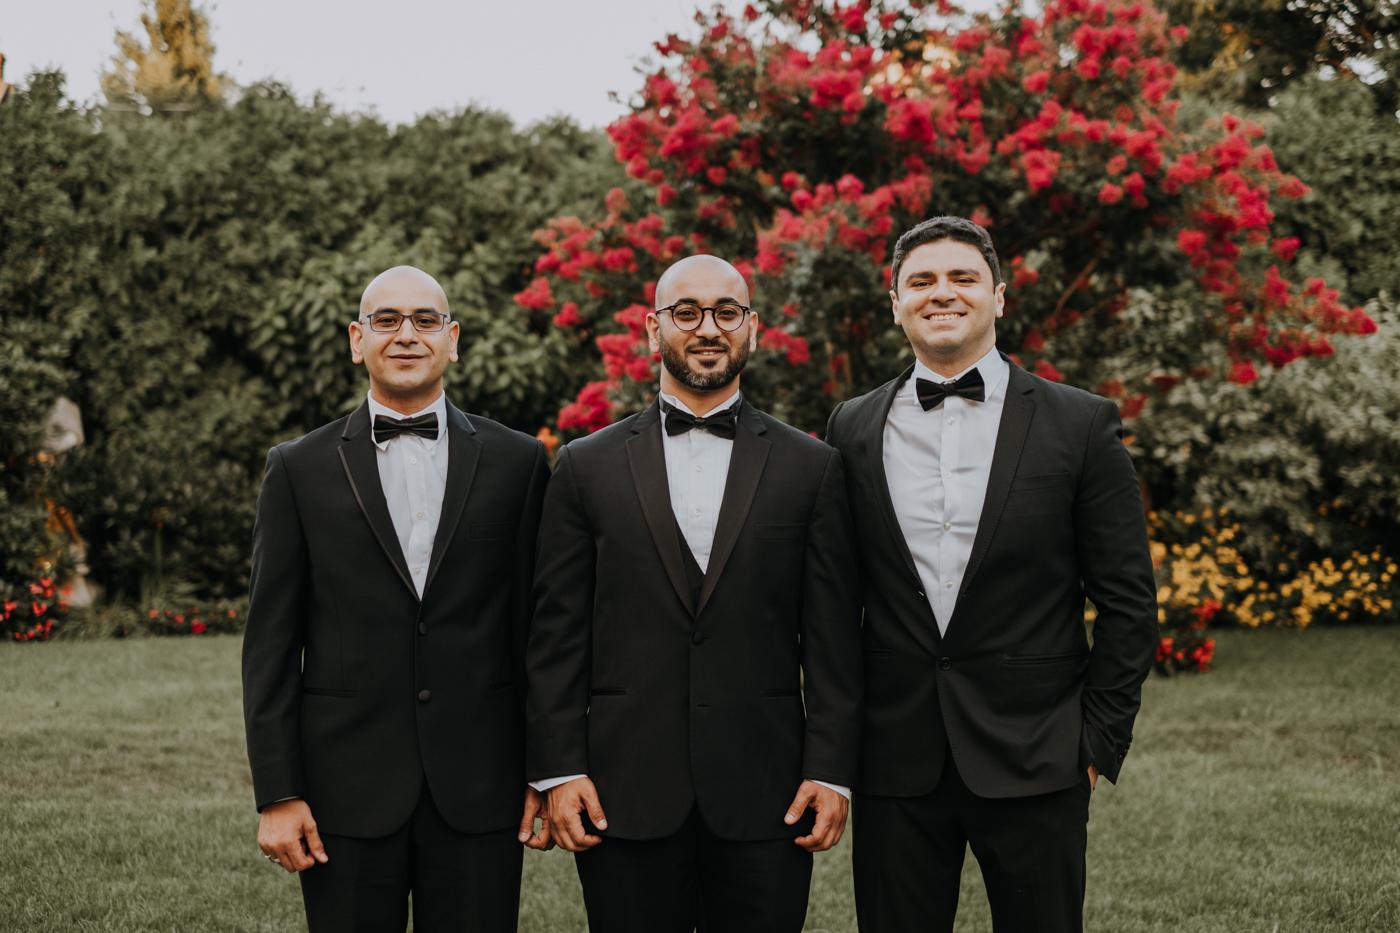 tampa wedding photography | brooklyn wedding photography | noura + amr